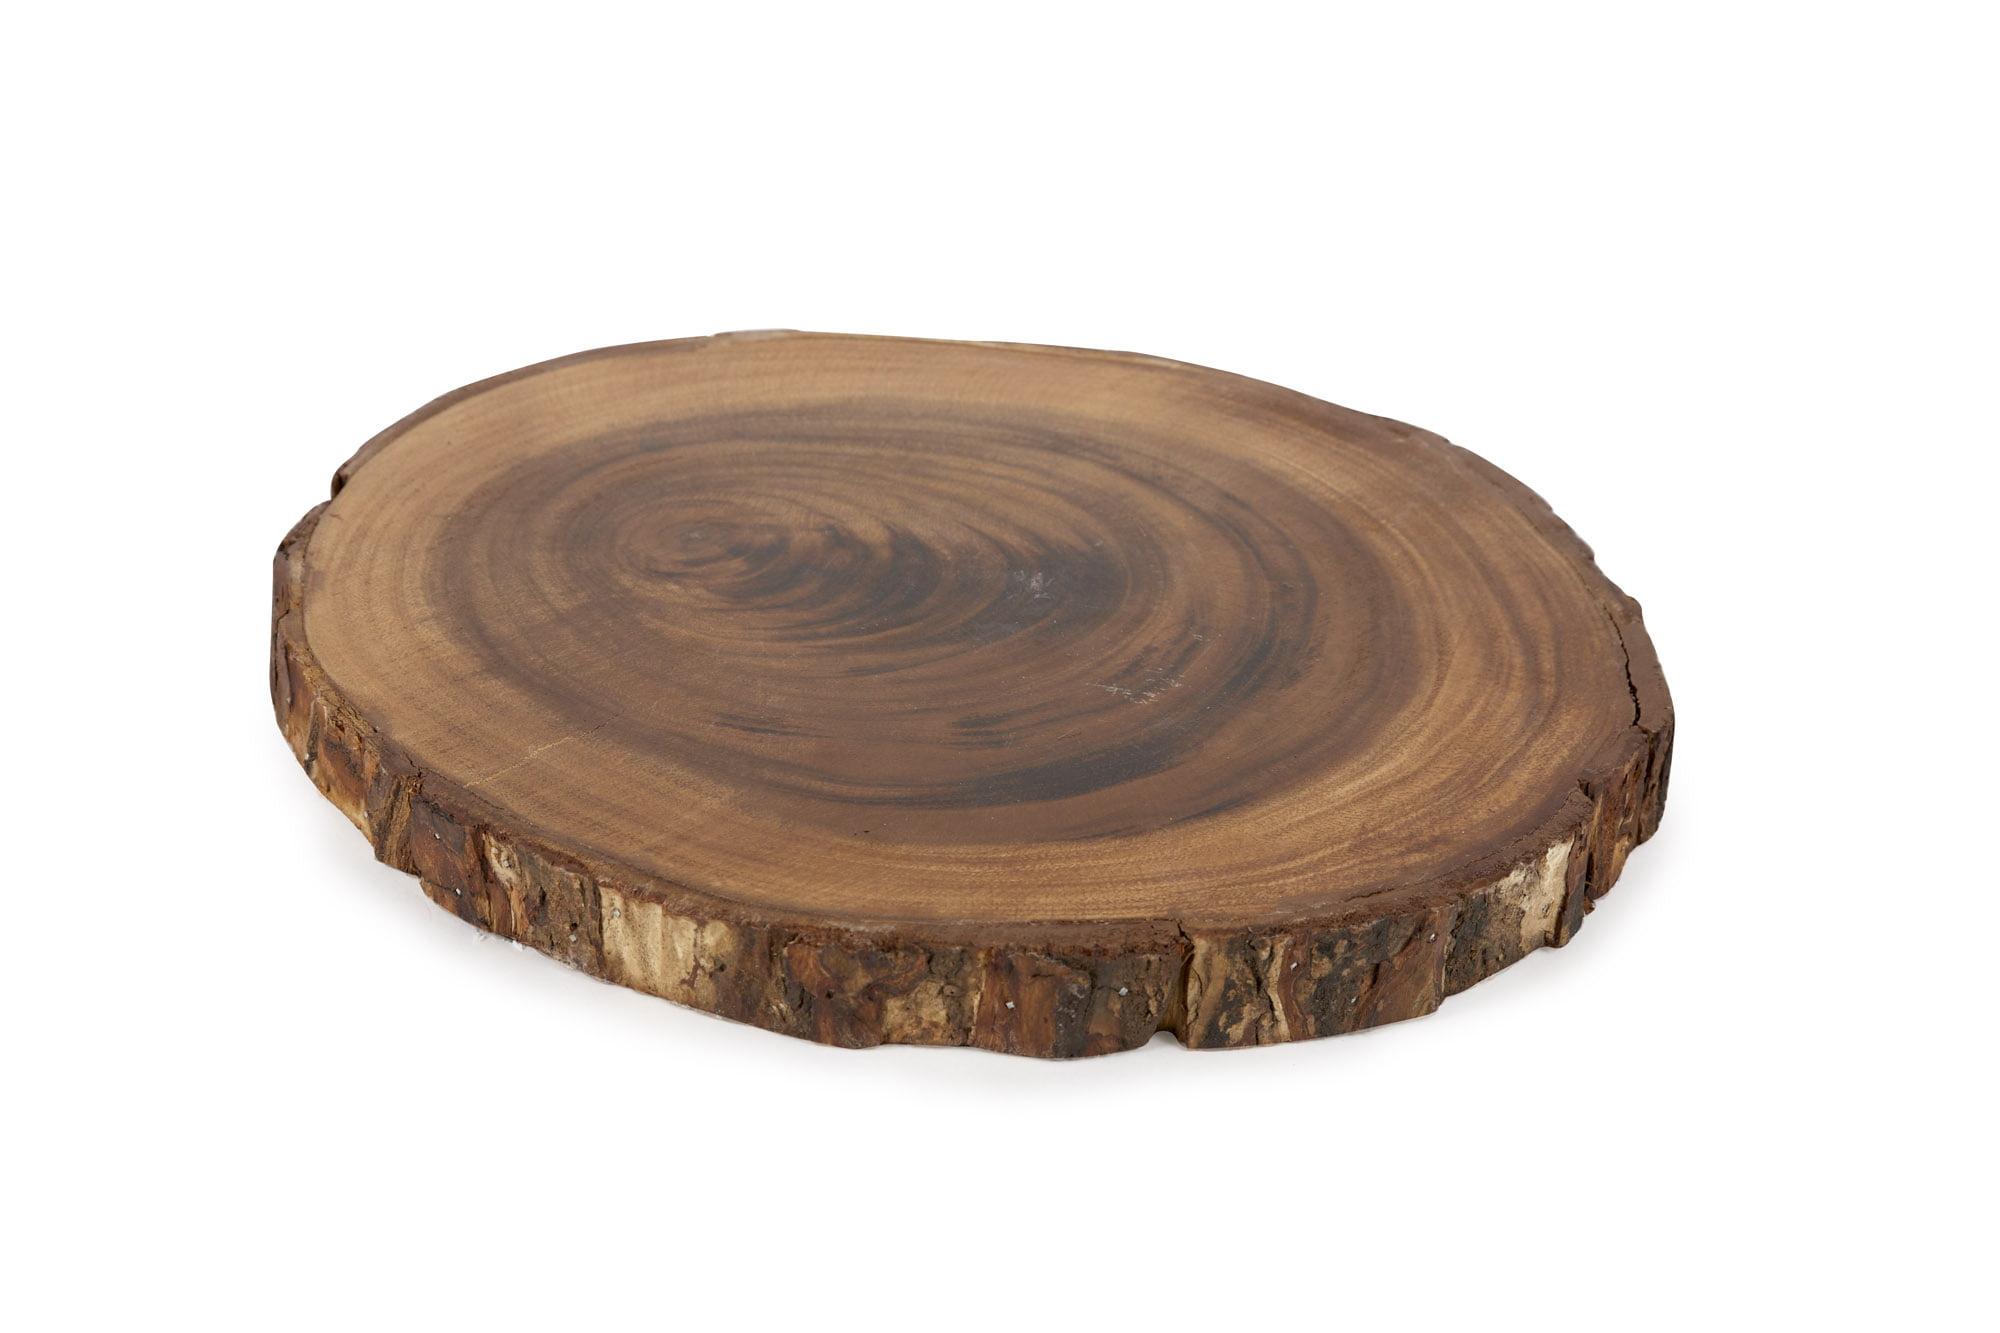 Better Homes and Gardens Acacia Wood Bark Charger - Walmart.com